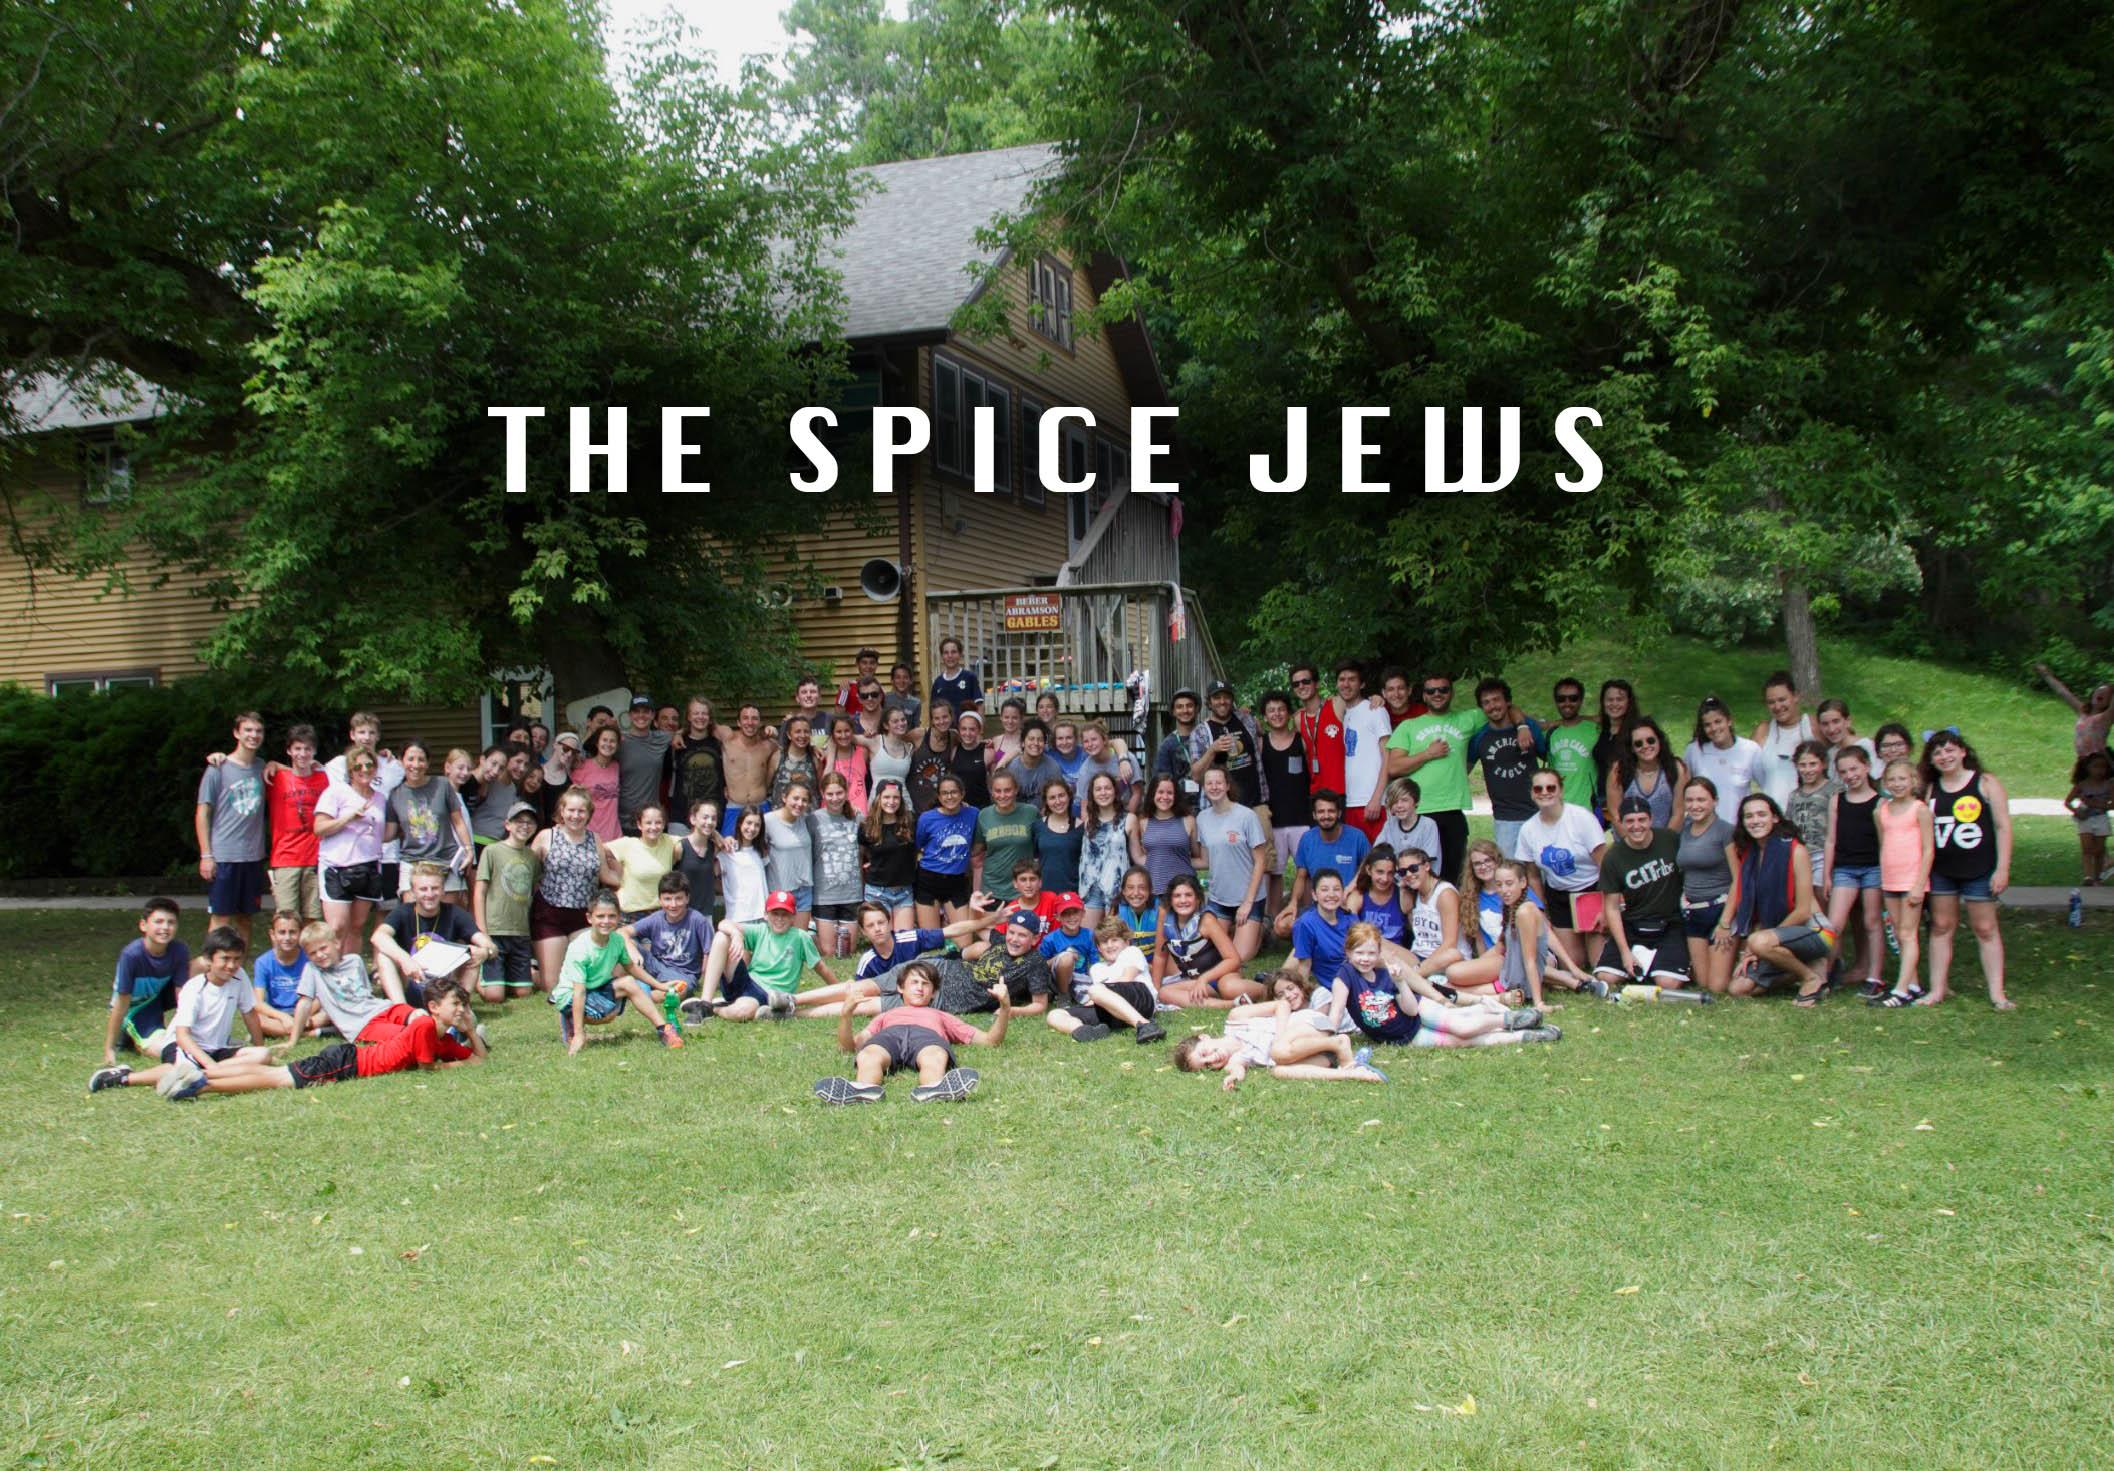 Spice Jews